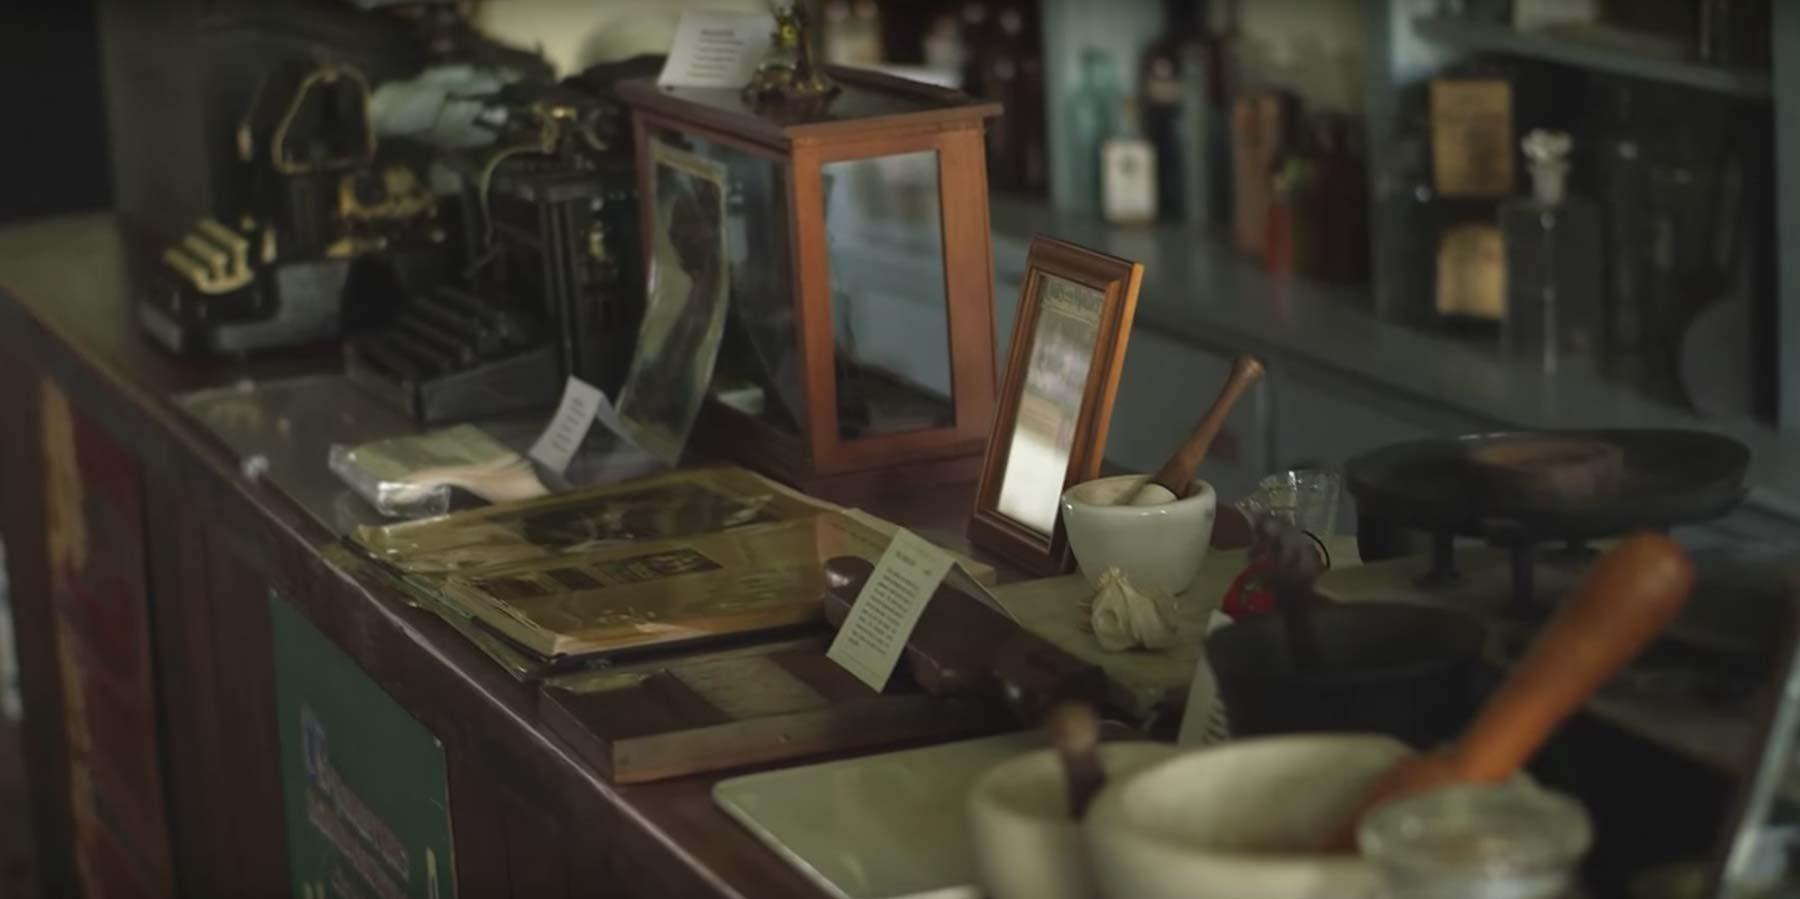 an old historic store front desk full of knick-knacks